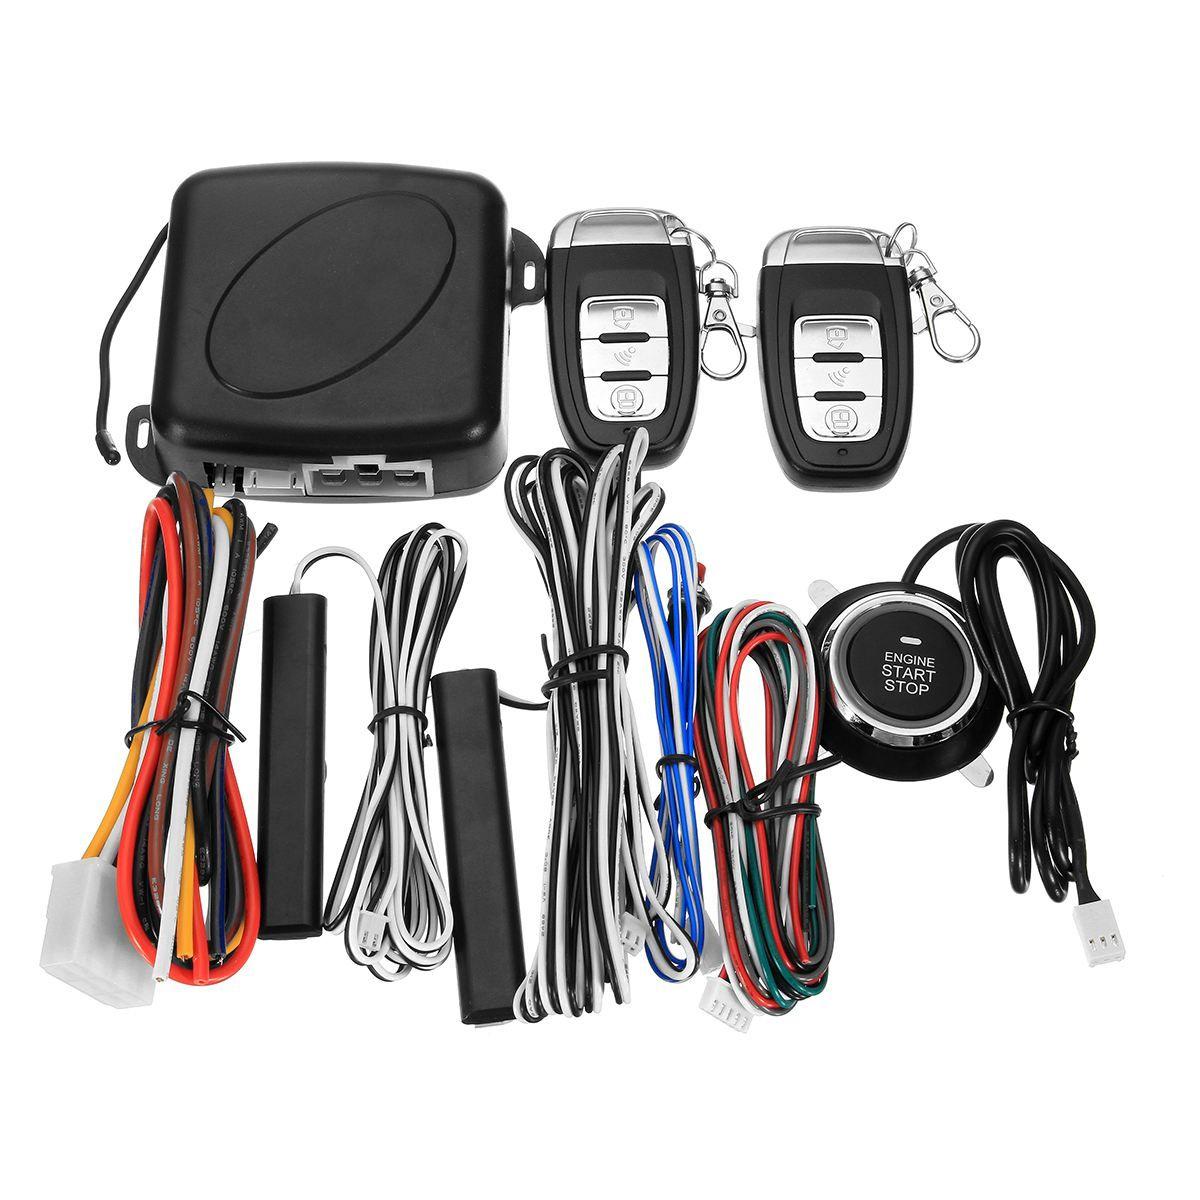 9Pcs Car SUV Keyless Entry Engine Start Alarm System Push Button Remote Starter